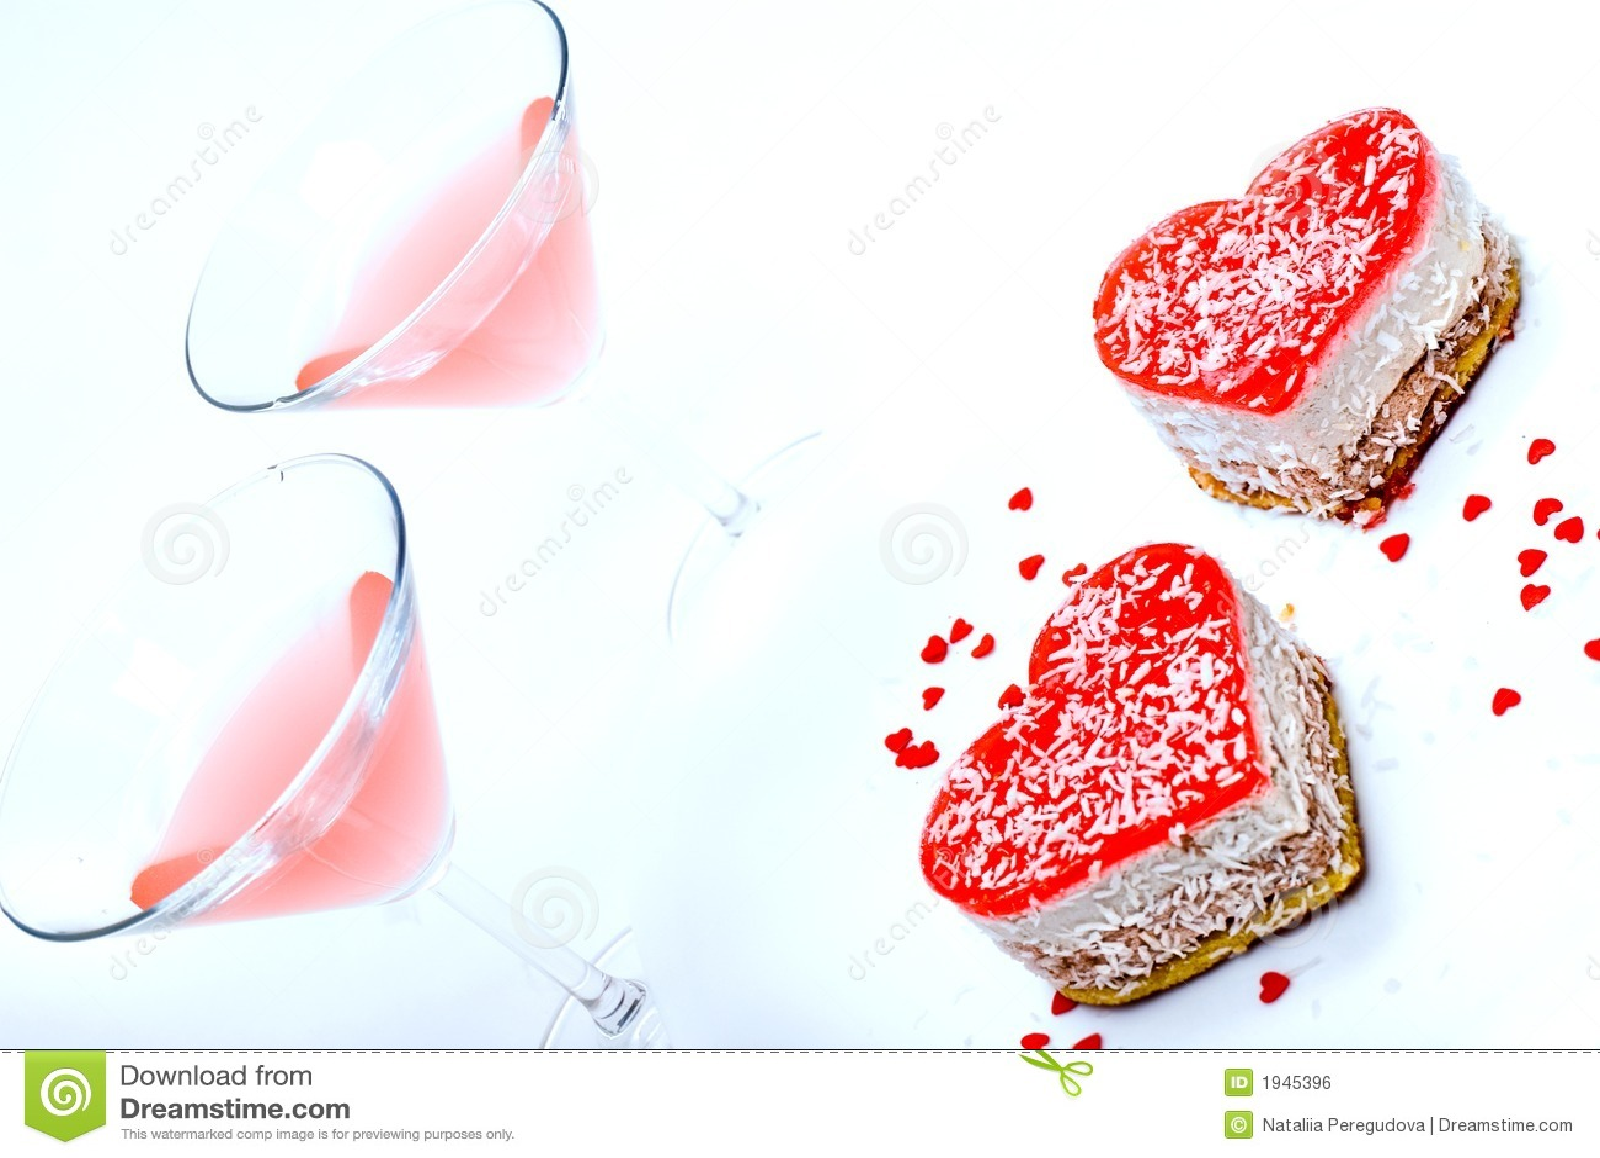 Sobremesa romântica para dois